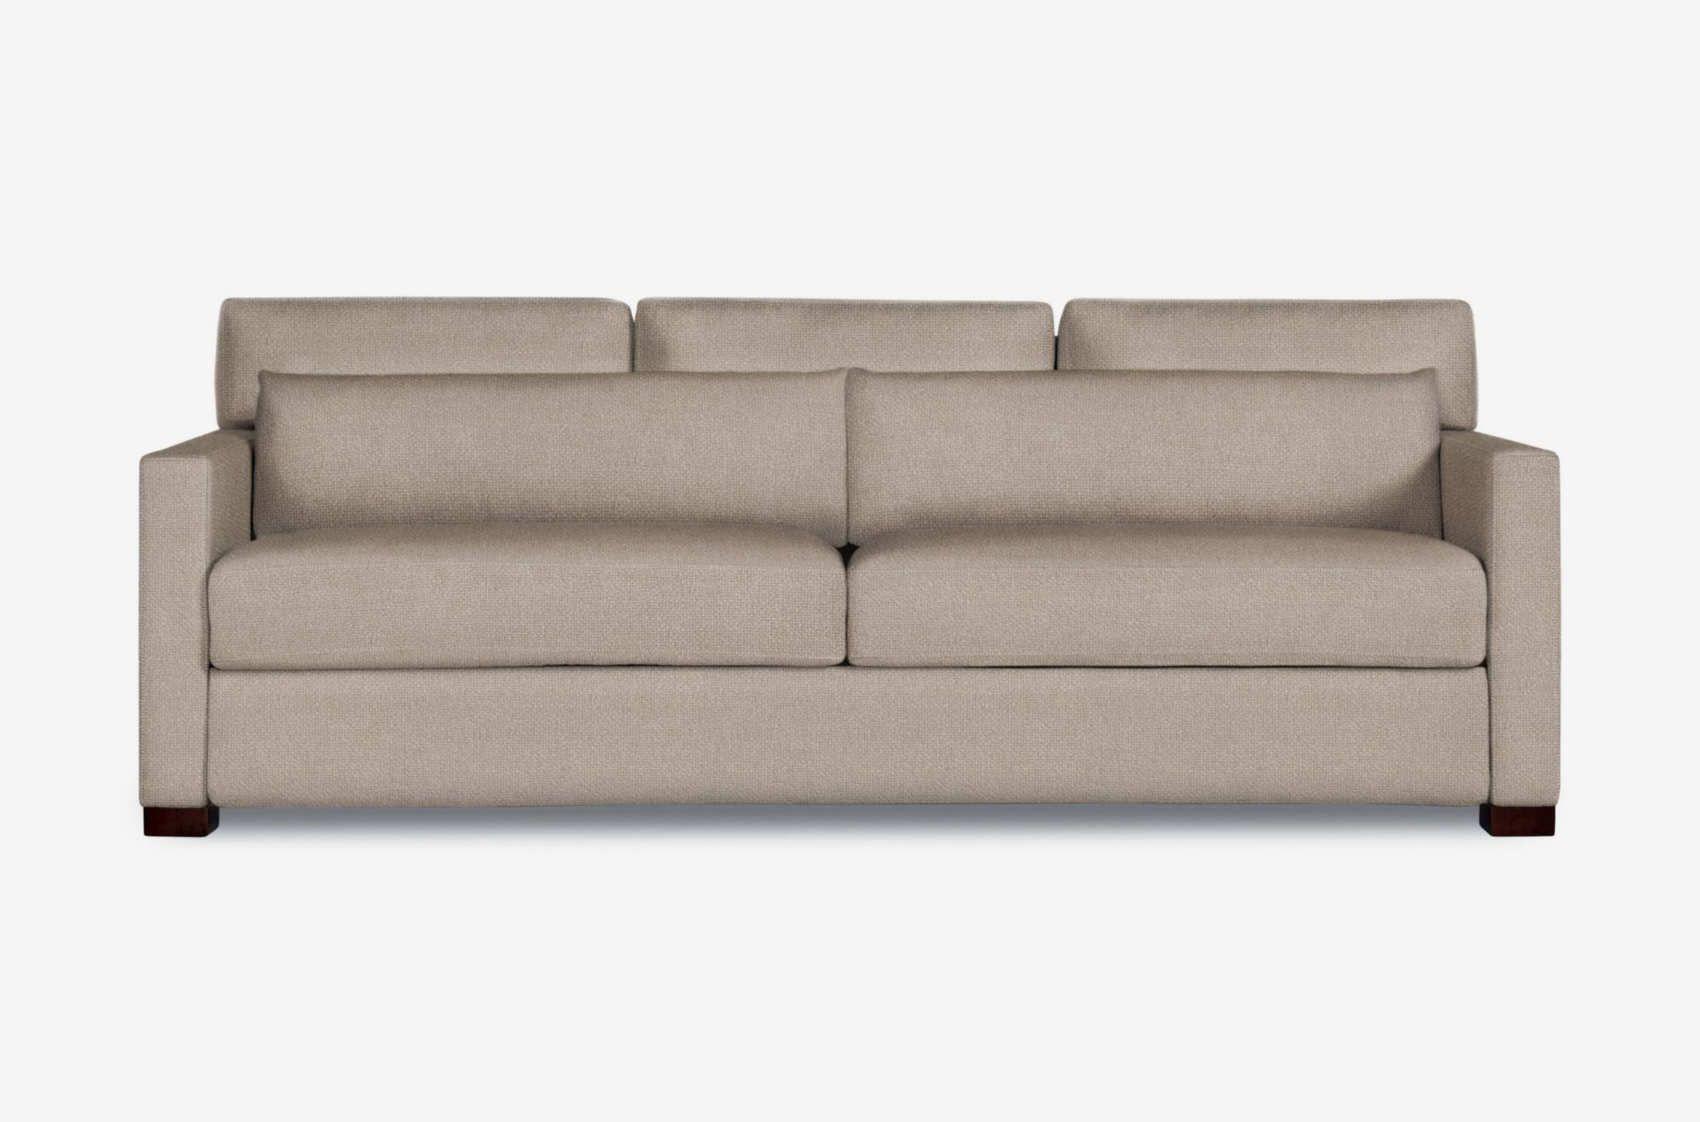 The Best Sleeper Sofas, According to Interior Designers ...